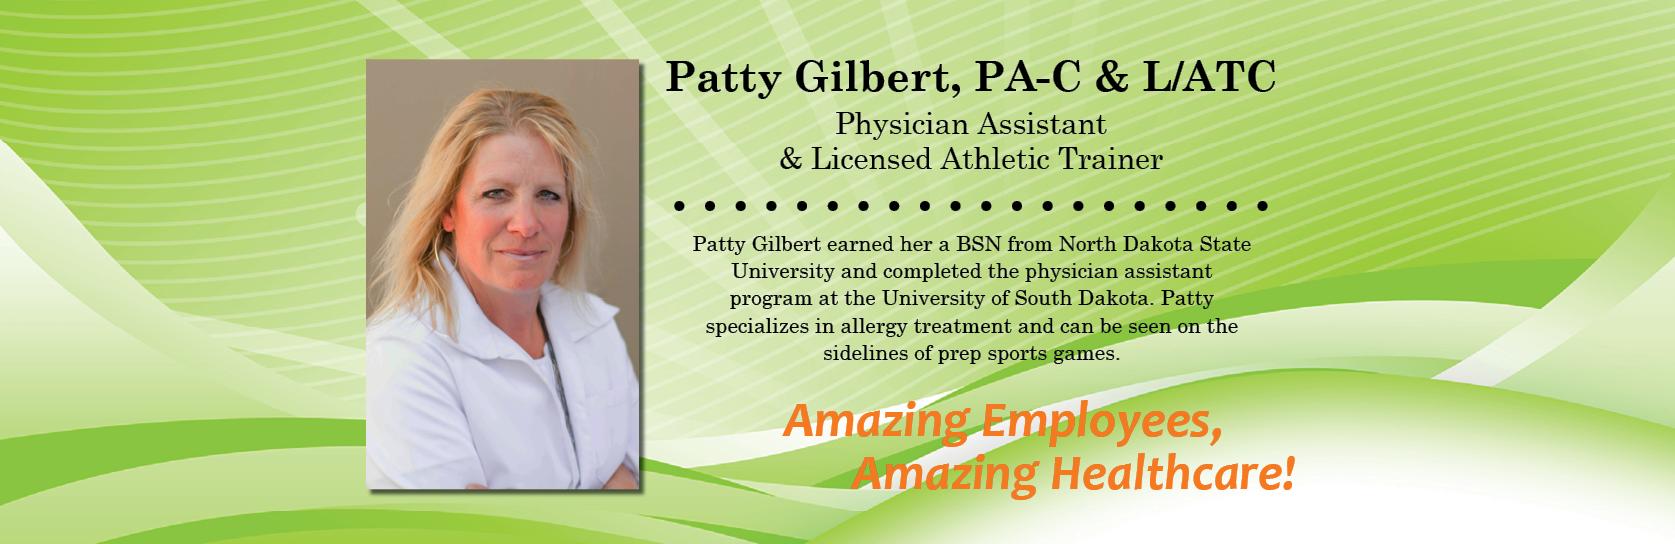 Patty Gilbert